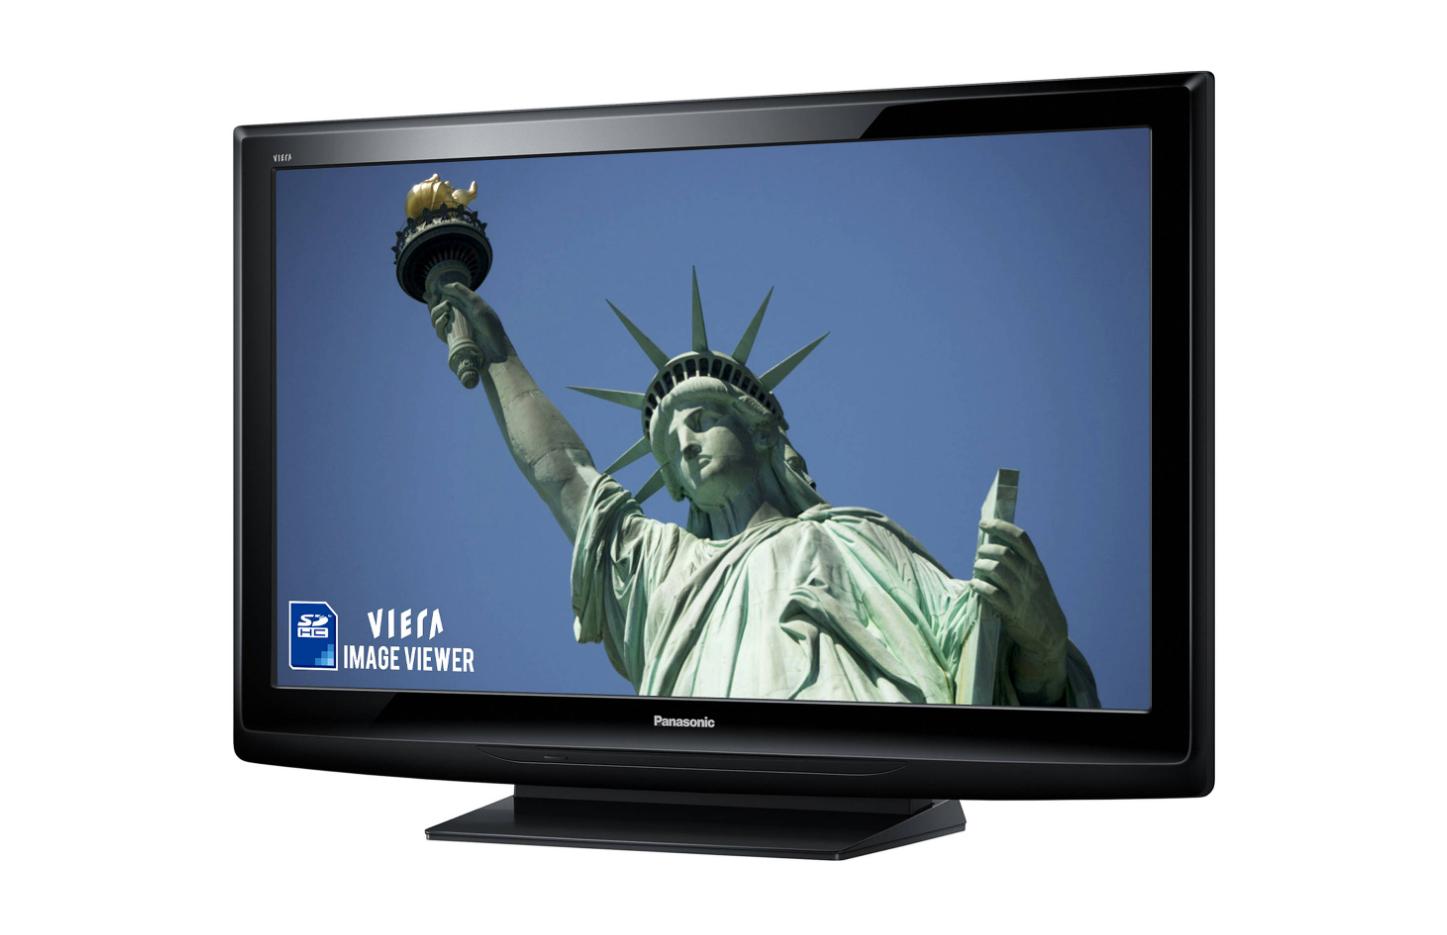 Panasonic TC-P42C2 Plasma TV Review